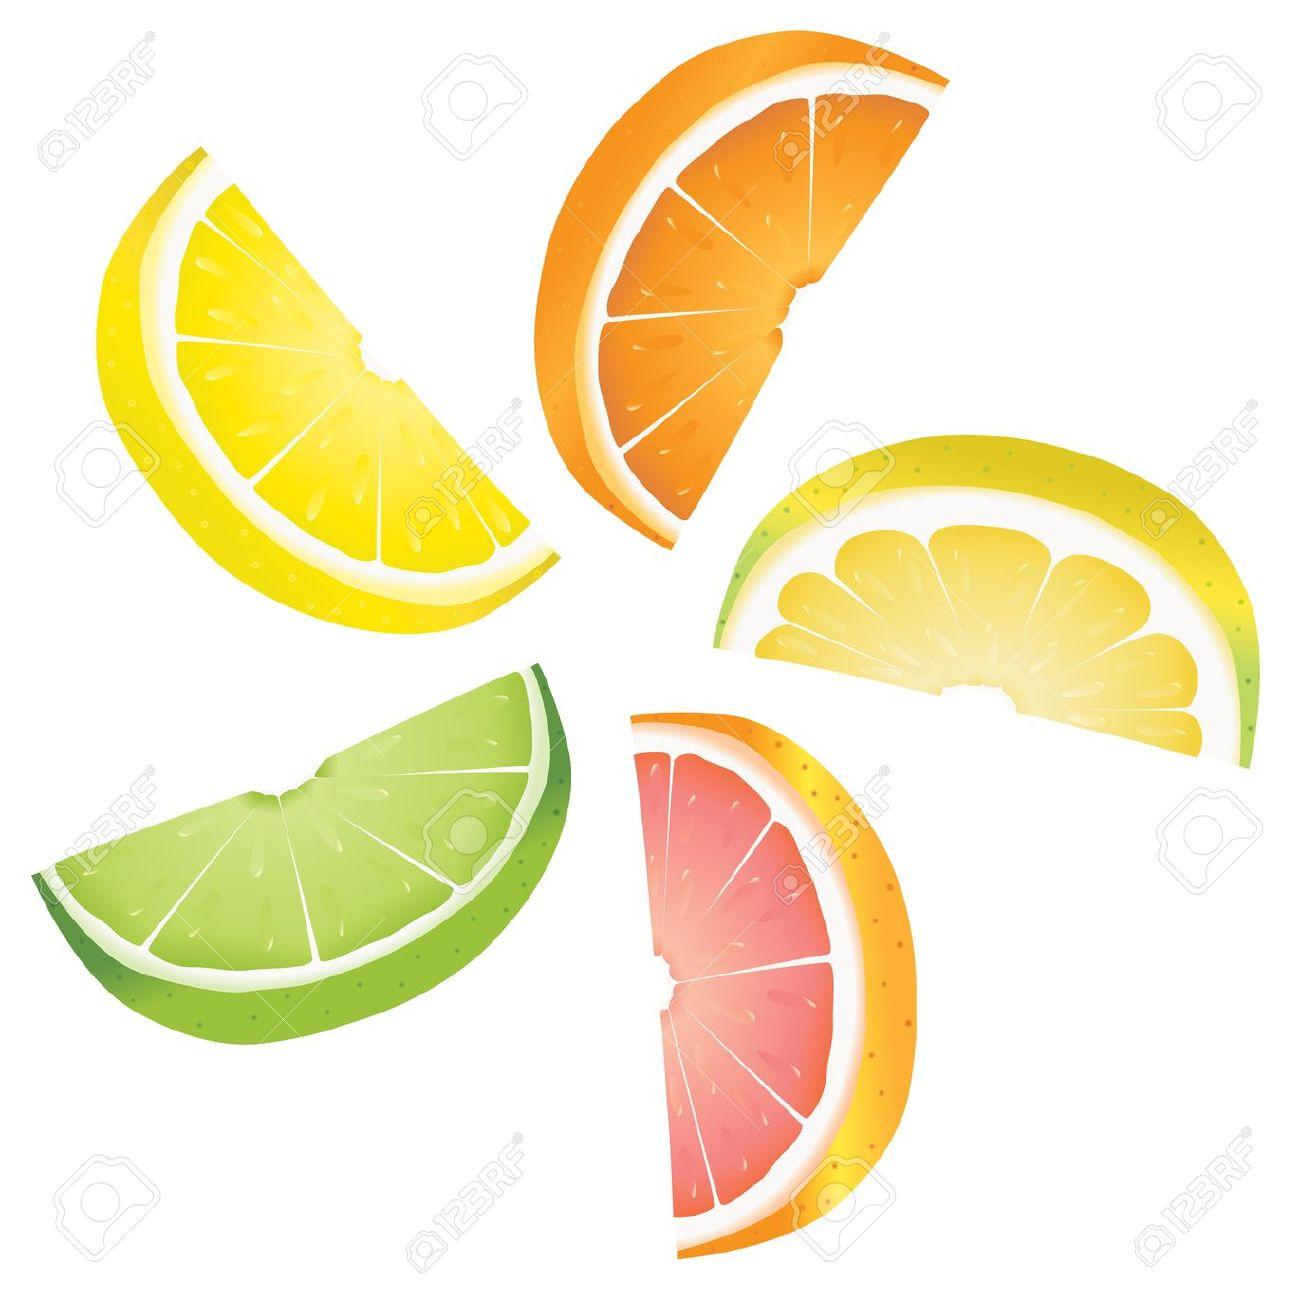 Lemon slices free download. Lemons clipart orange